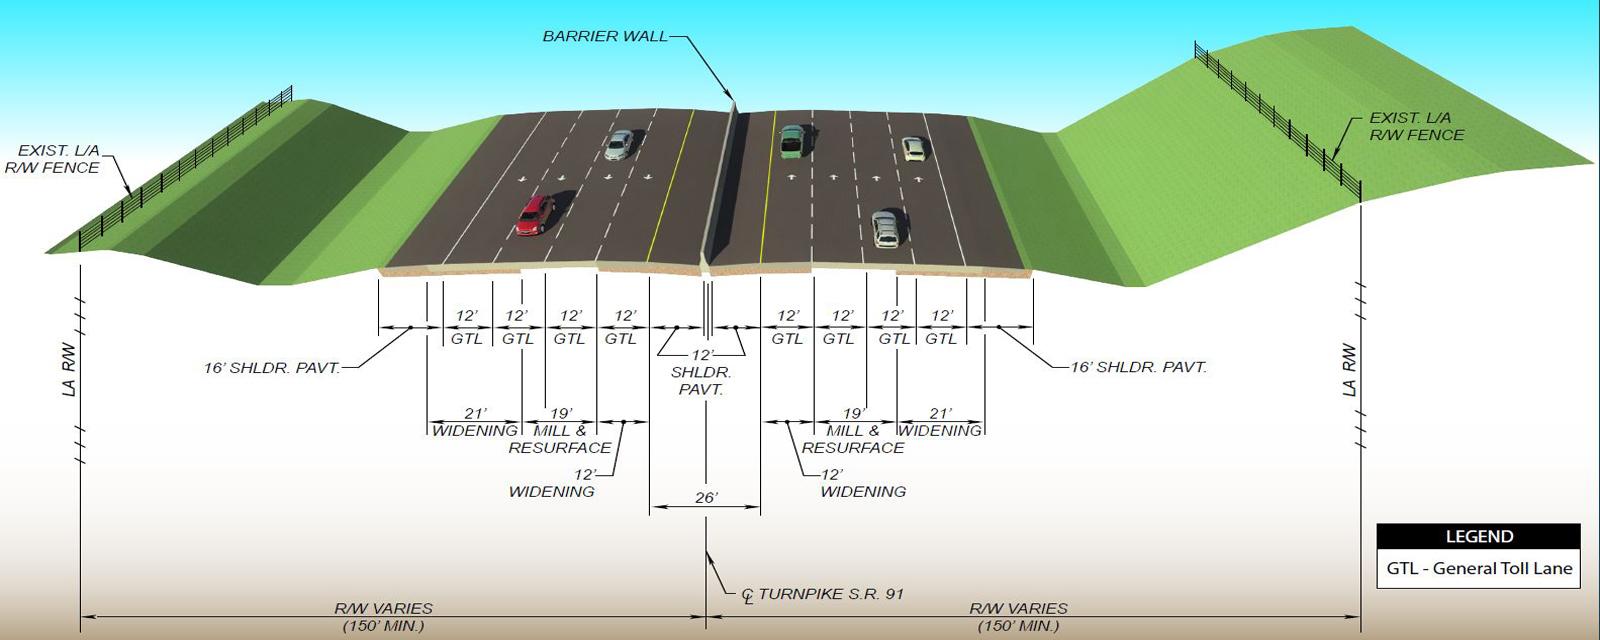 Florida's Mainline Turnpike (SR 91) Widening from SR 50